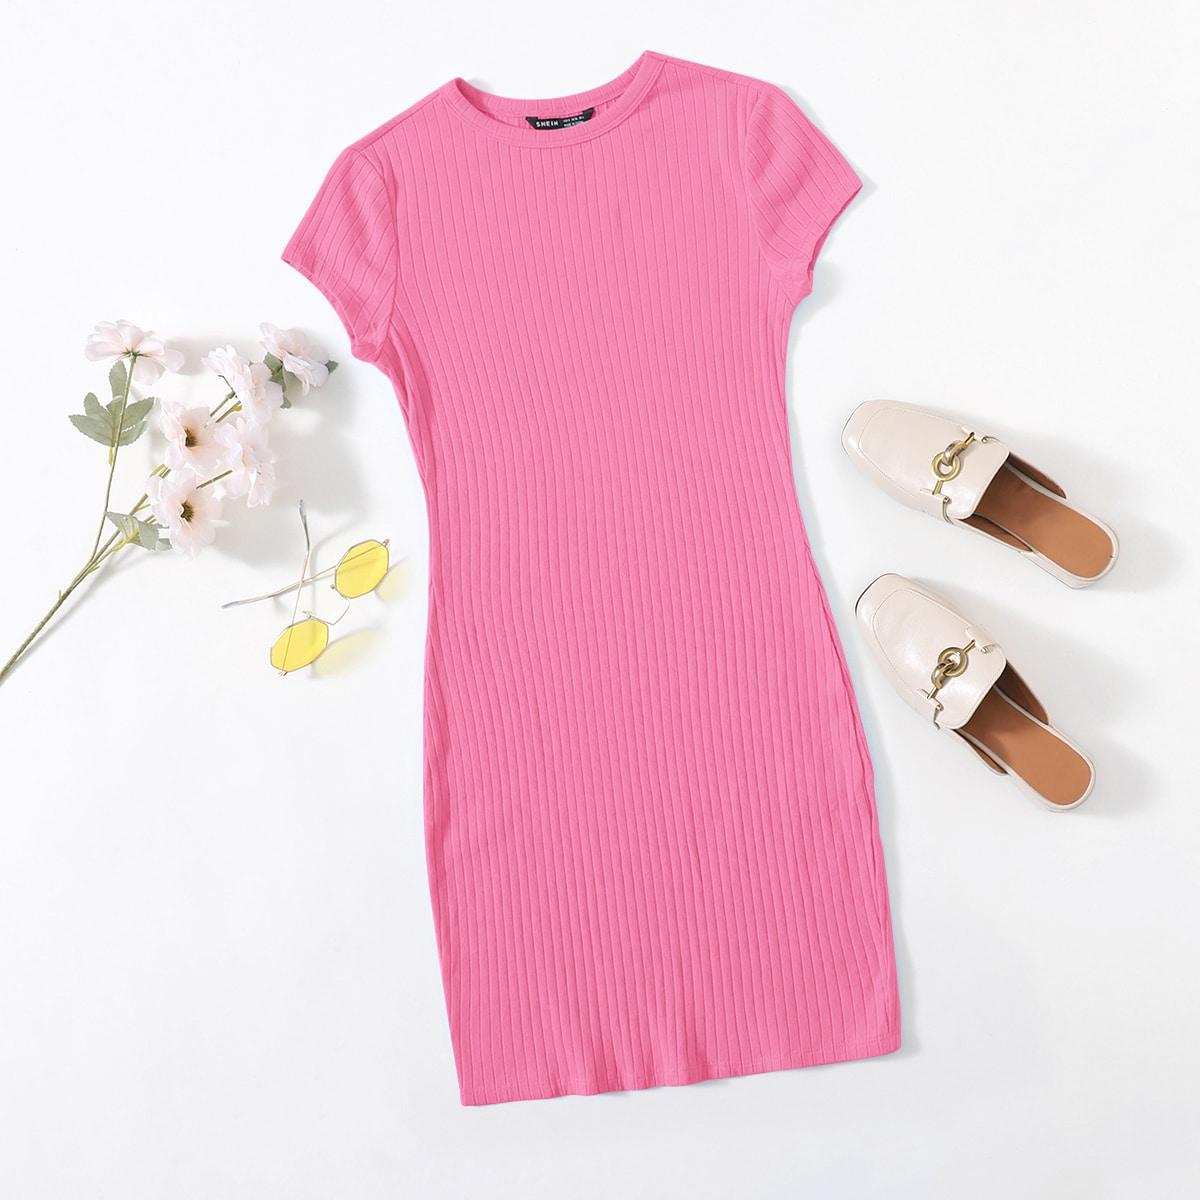 Вязаное платье в рубчик SheIn swdress07210519581